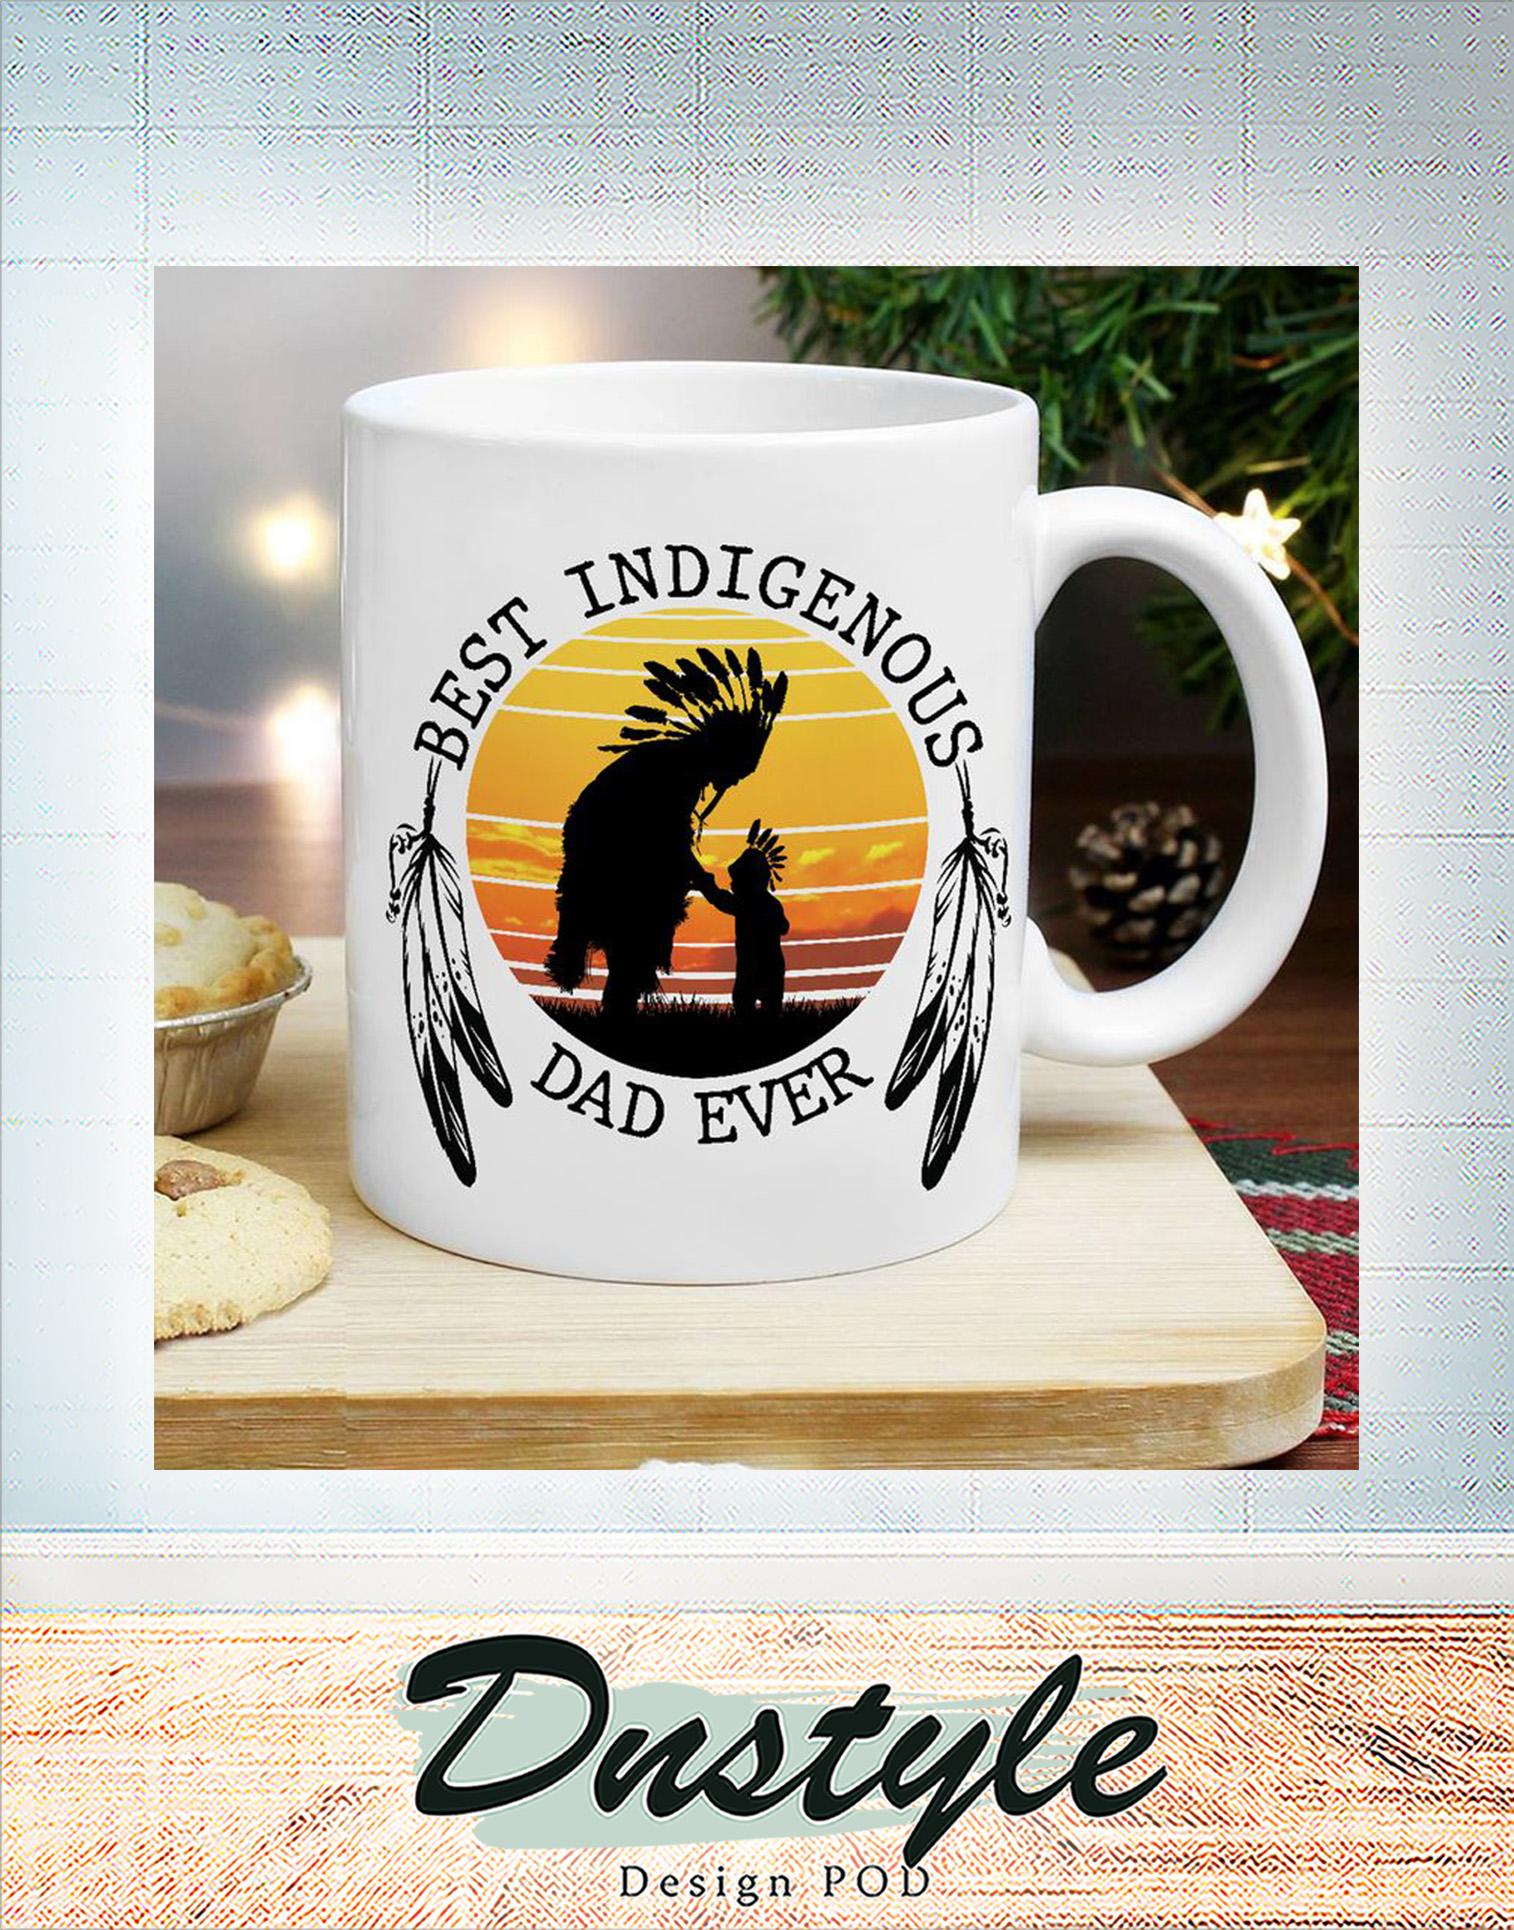 Native American Best indigenous dad ever mug